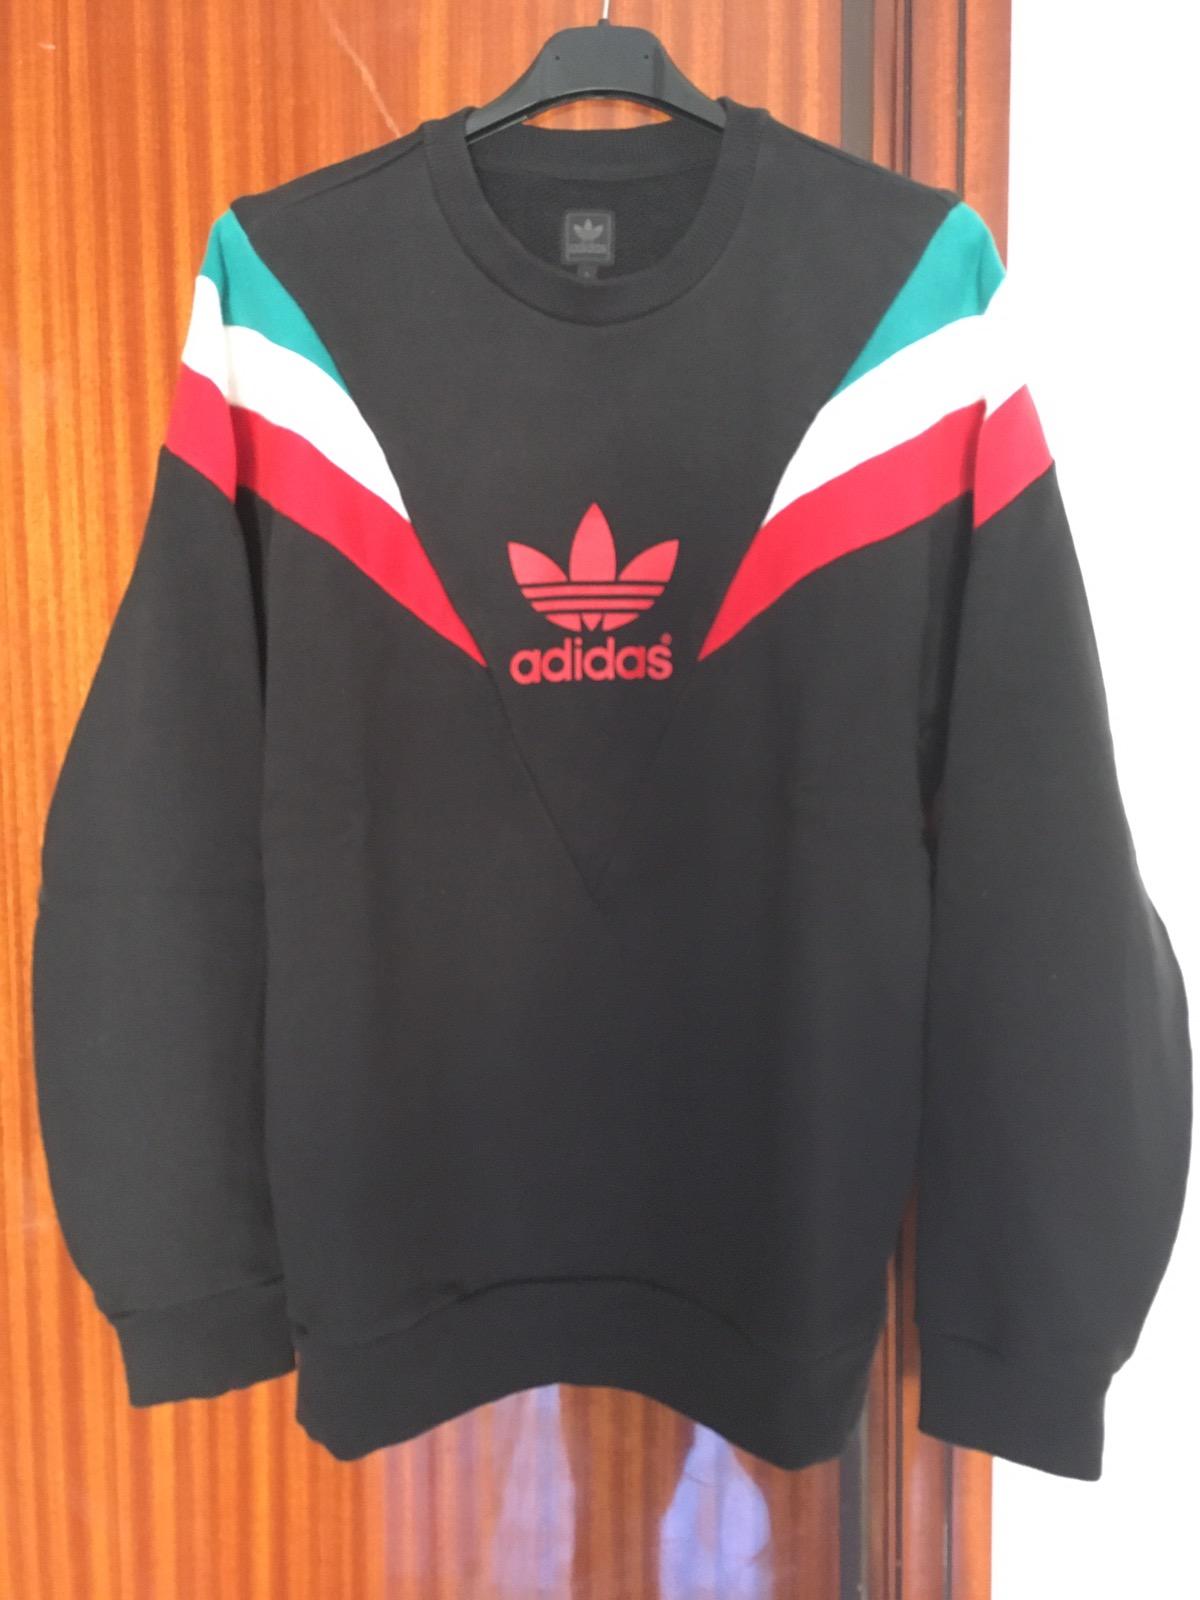 rocky 4 adidas sweatshirt for sale